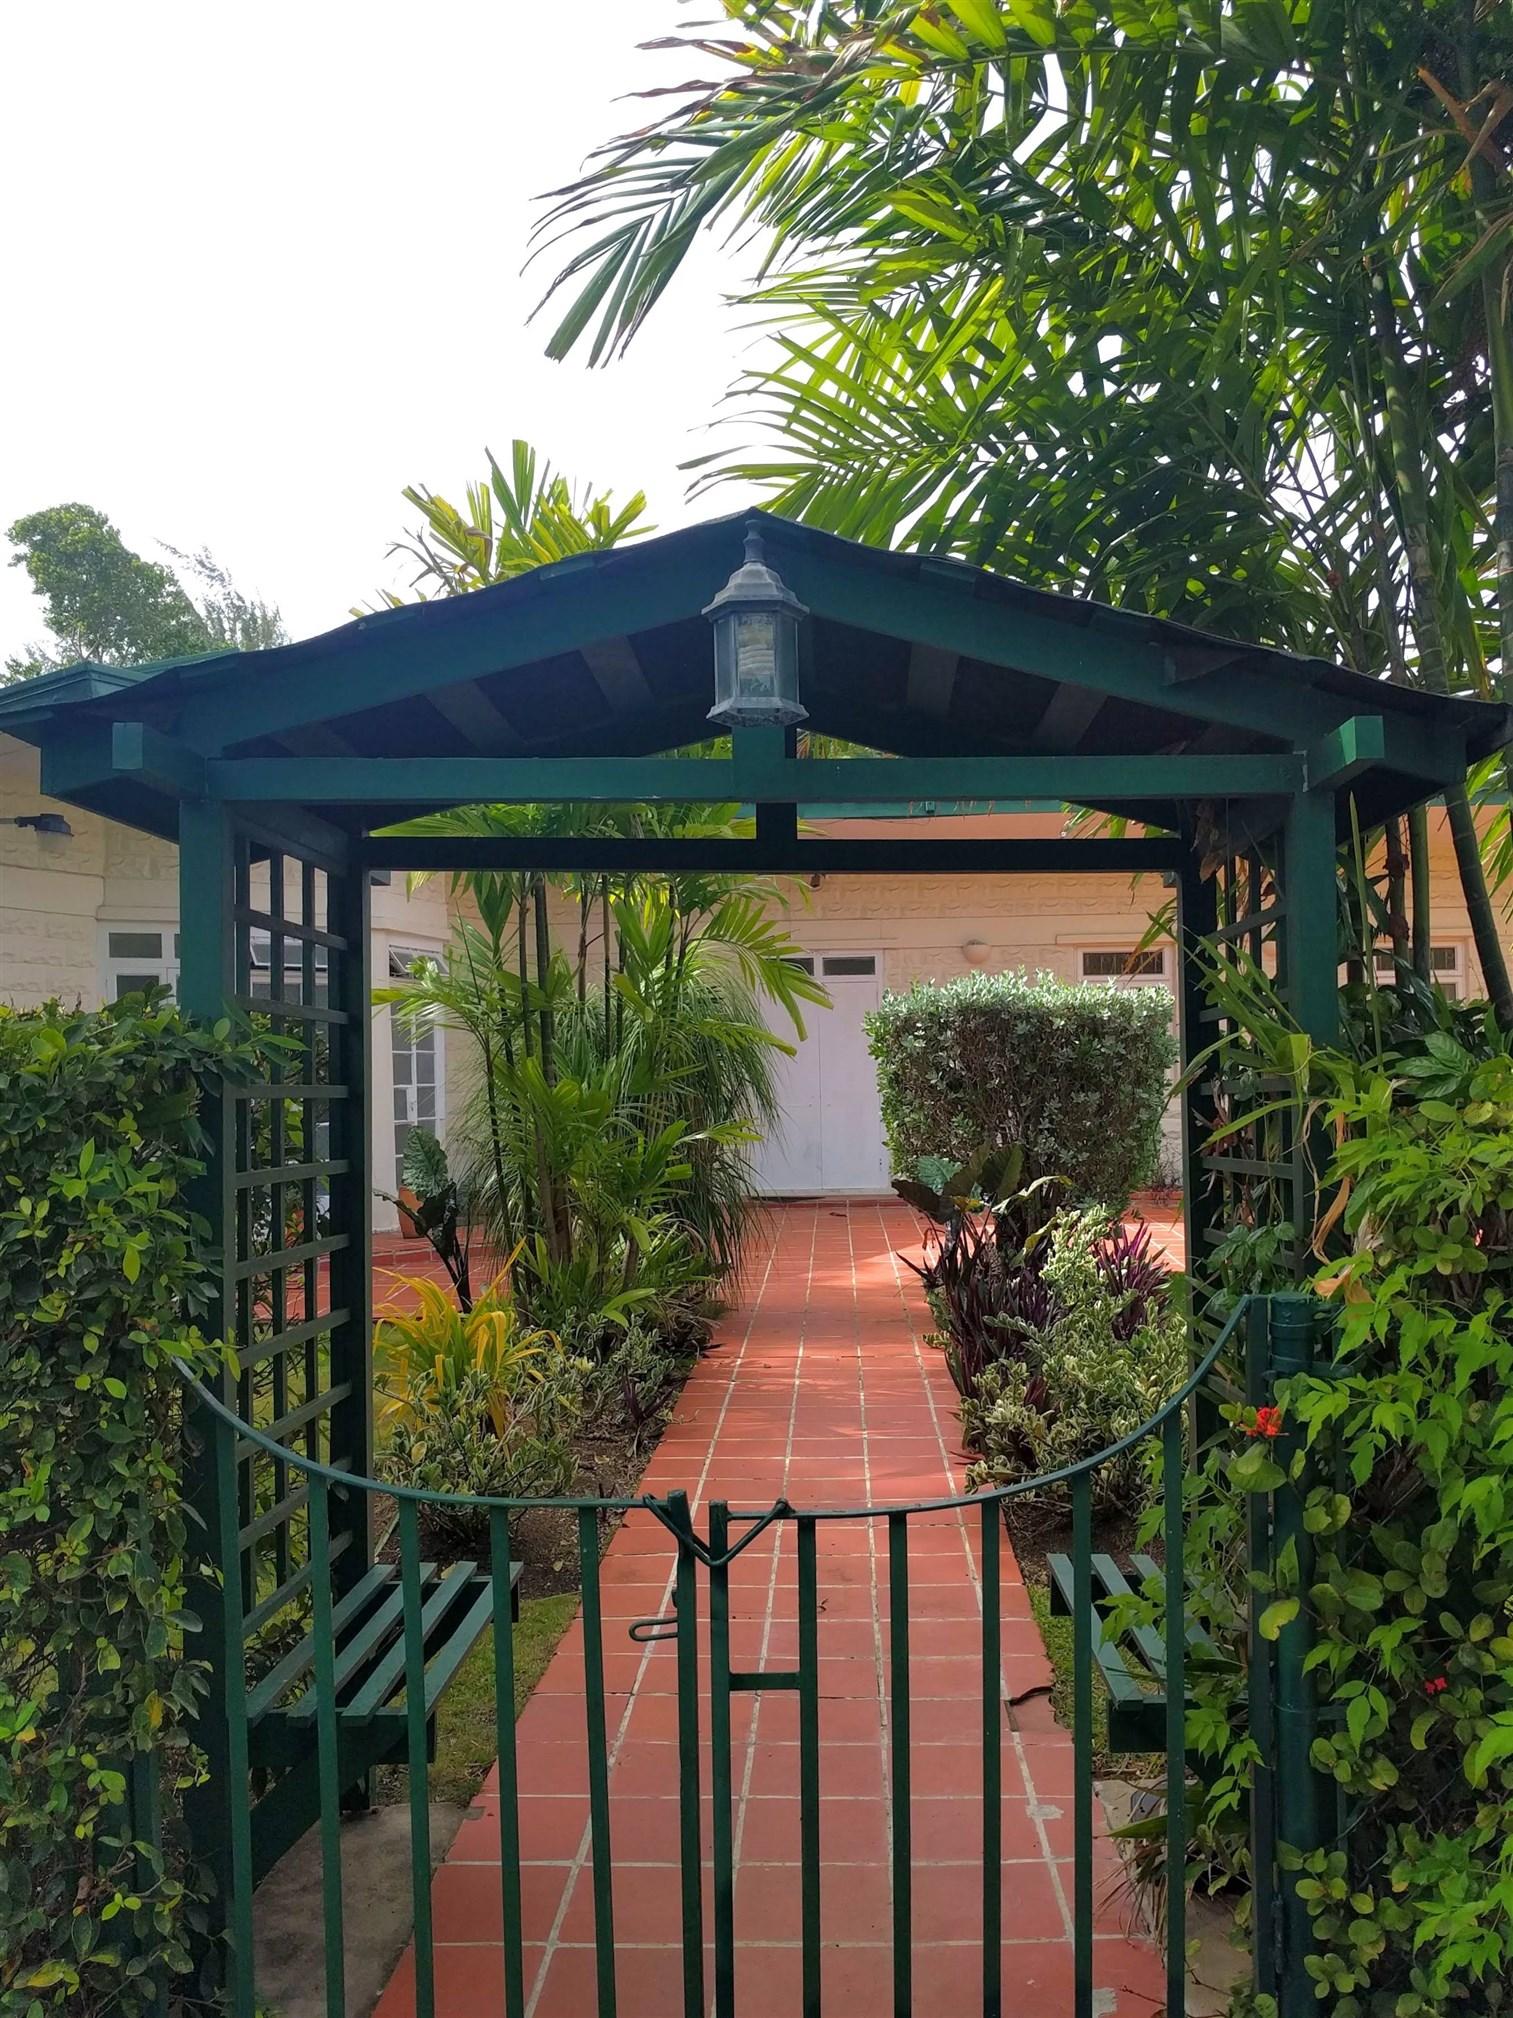 Entrance, Rockley New Road